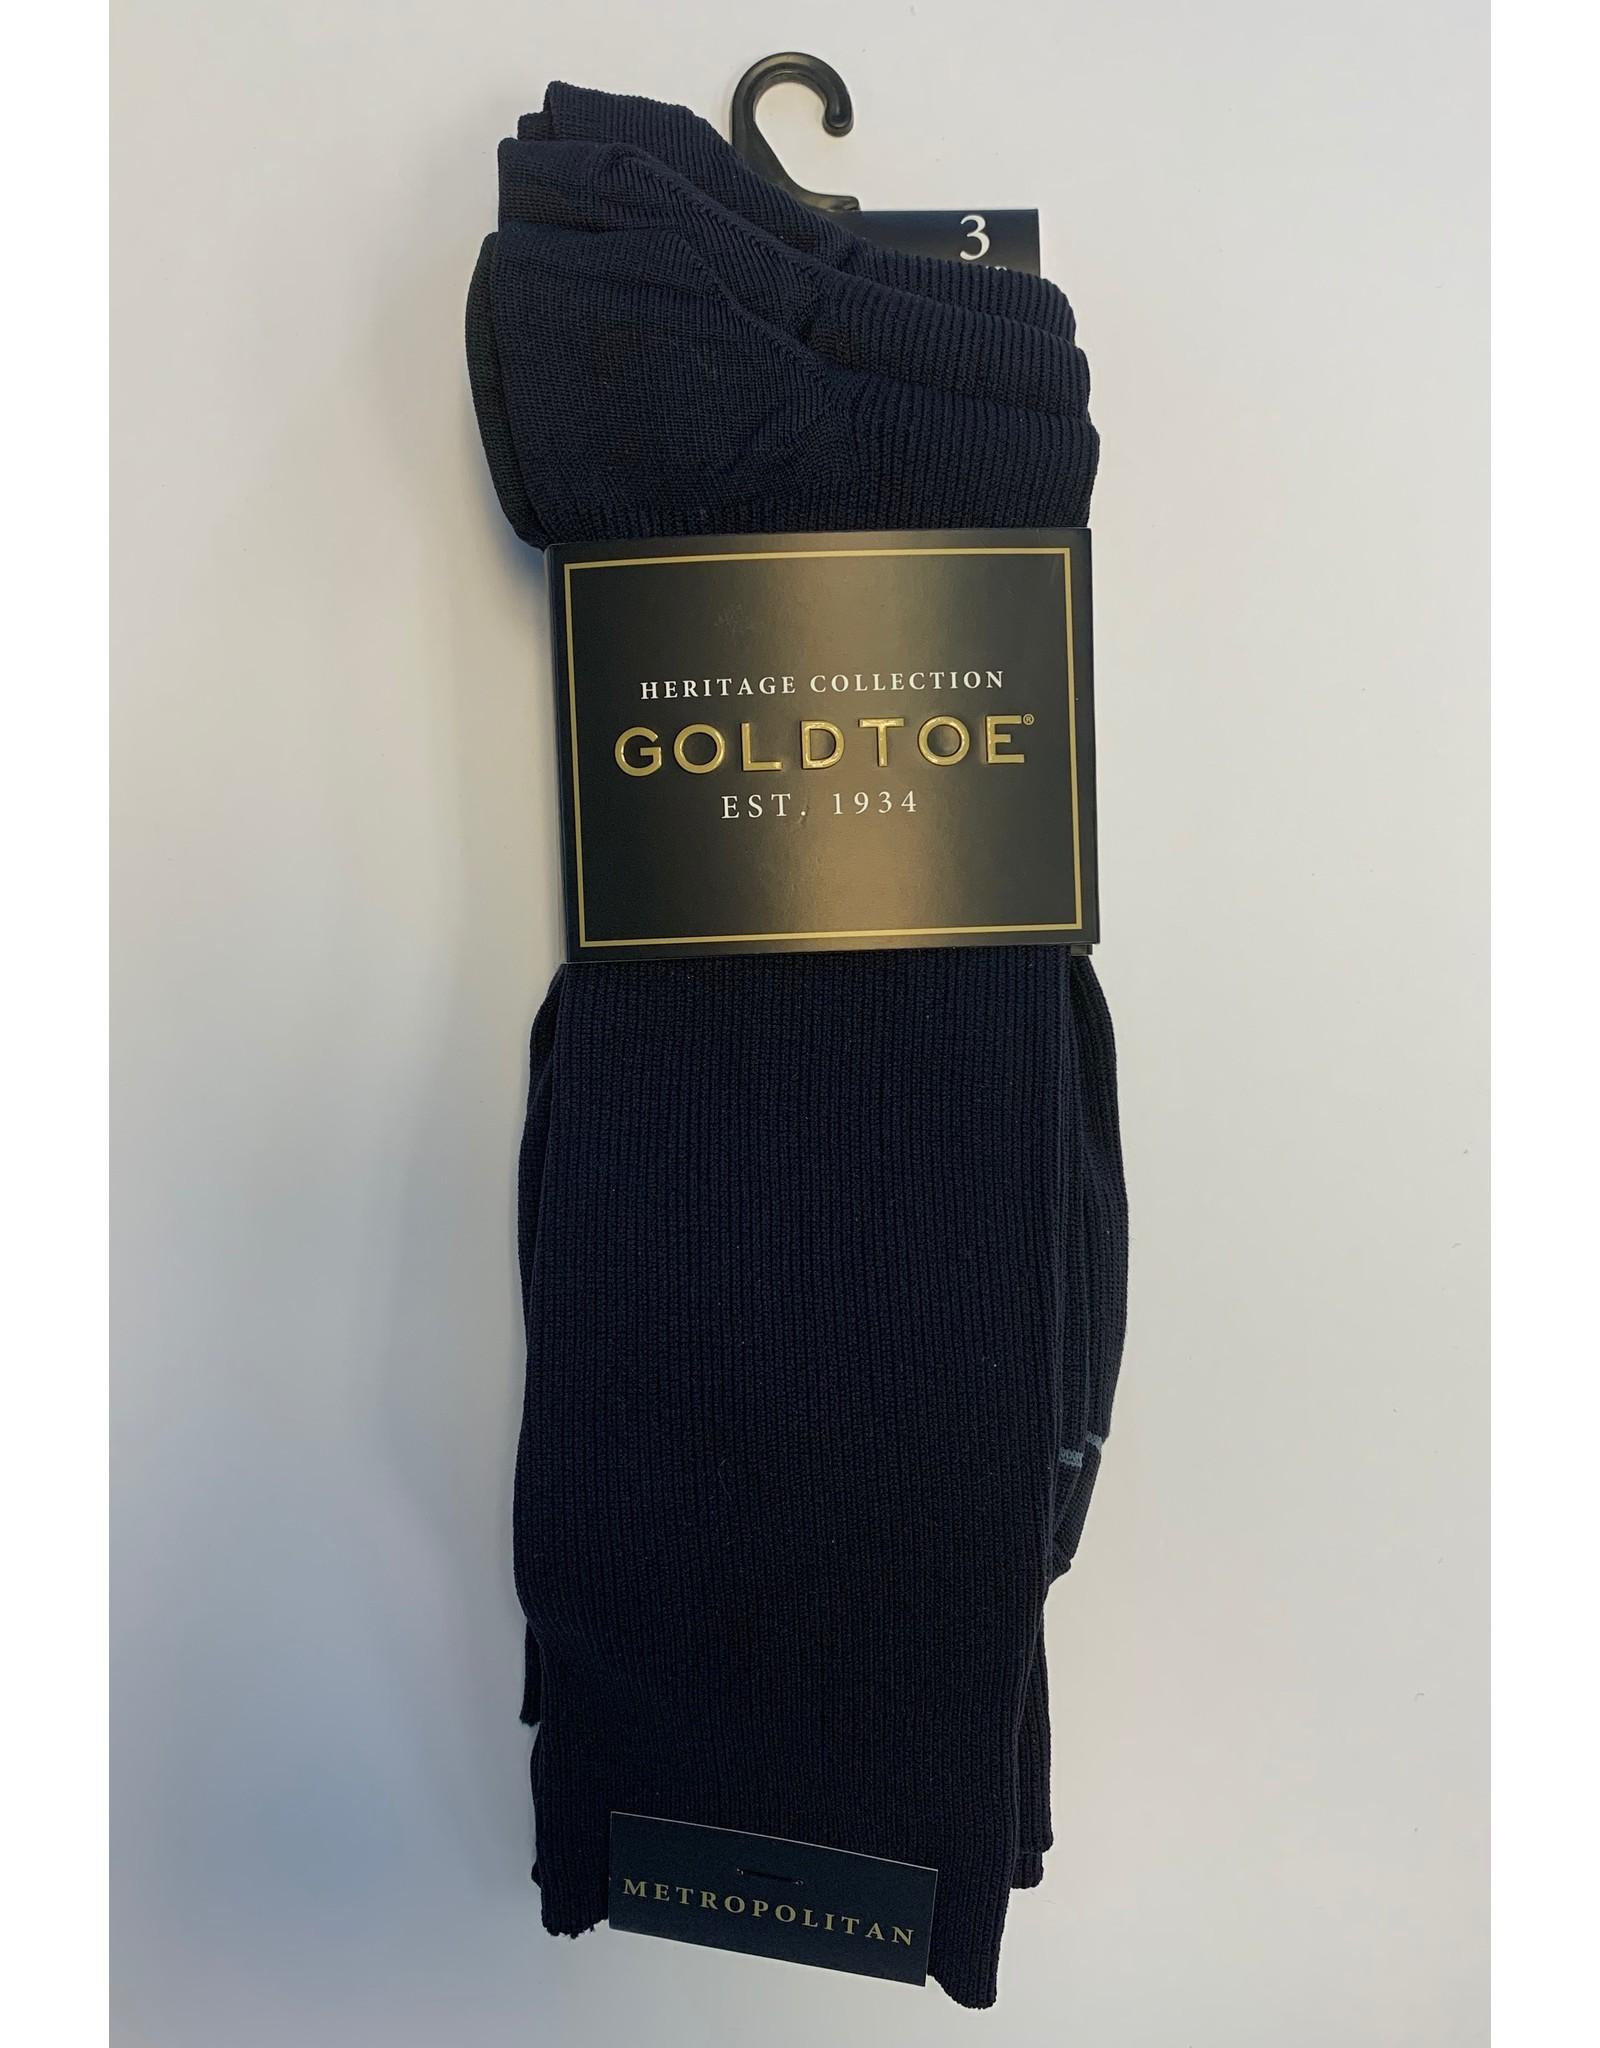 Goldtoe Goldtoe Men's Metropolitan Reinforced Toe Socks - 3 Pack 101S